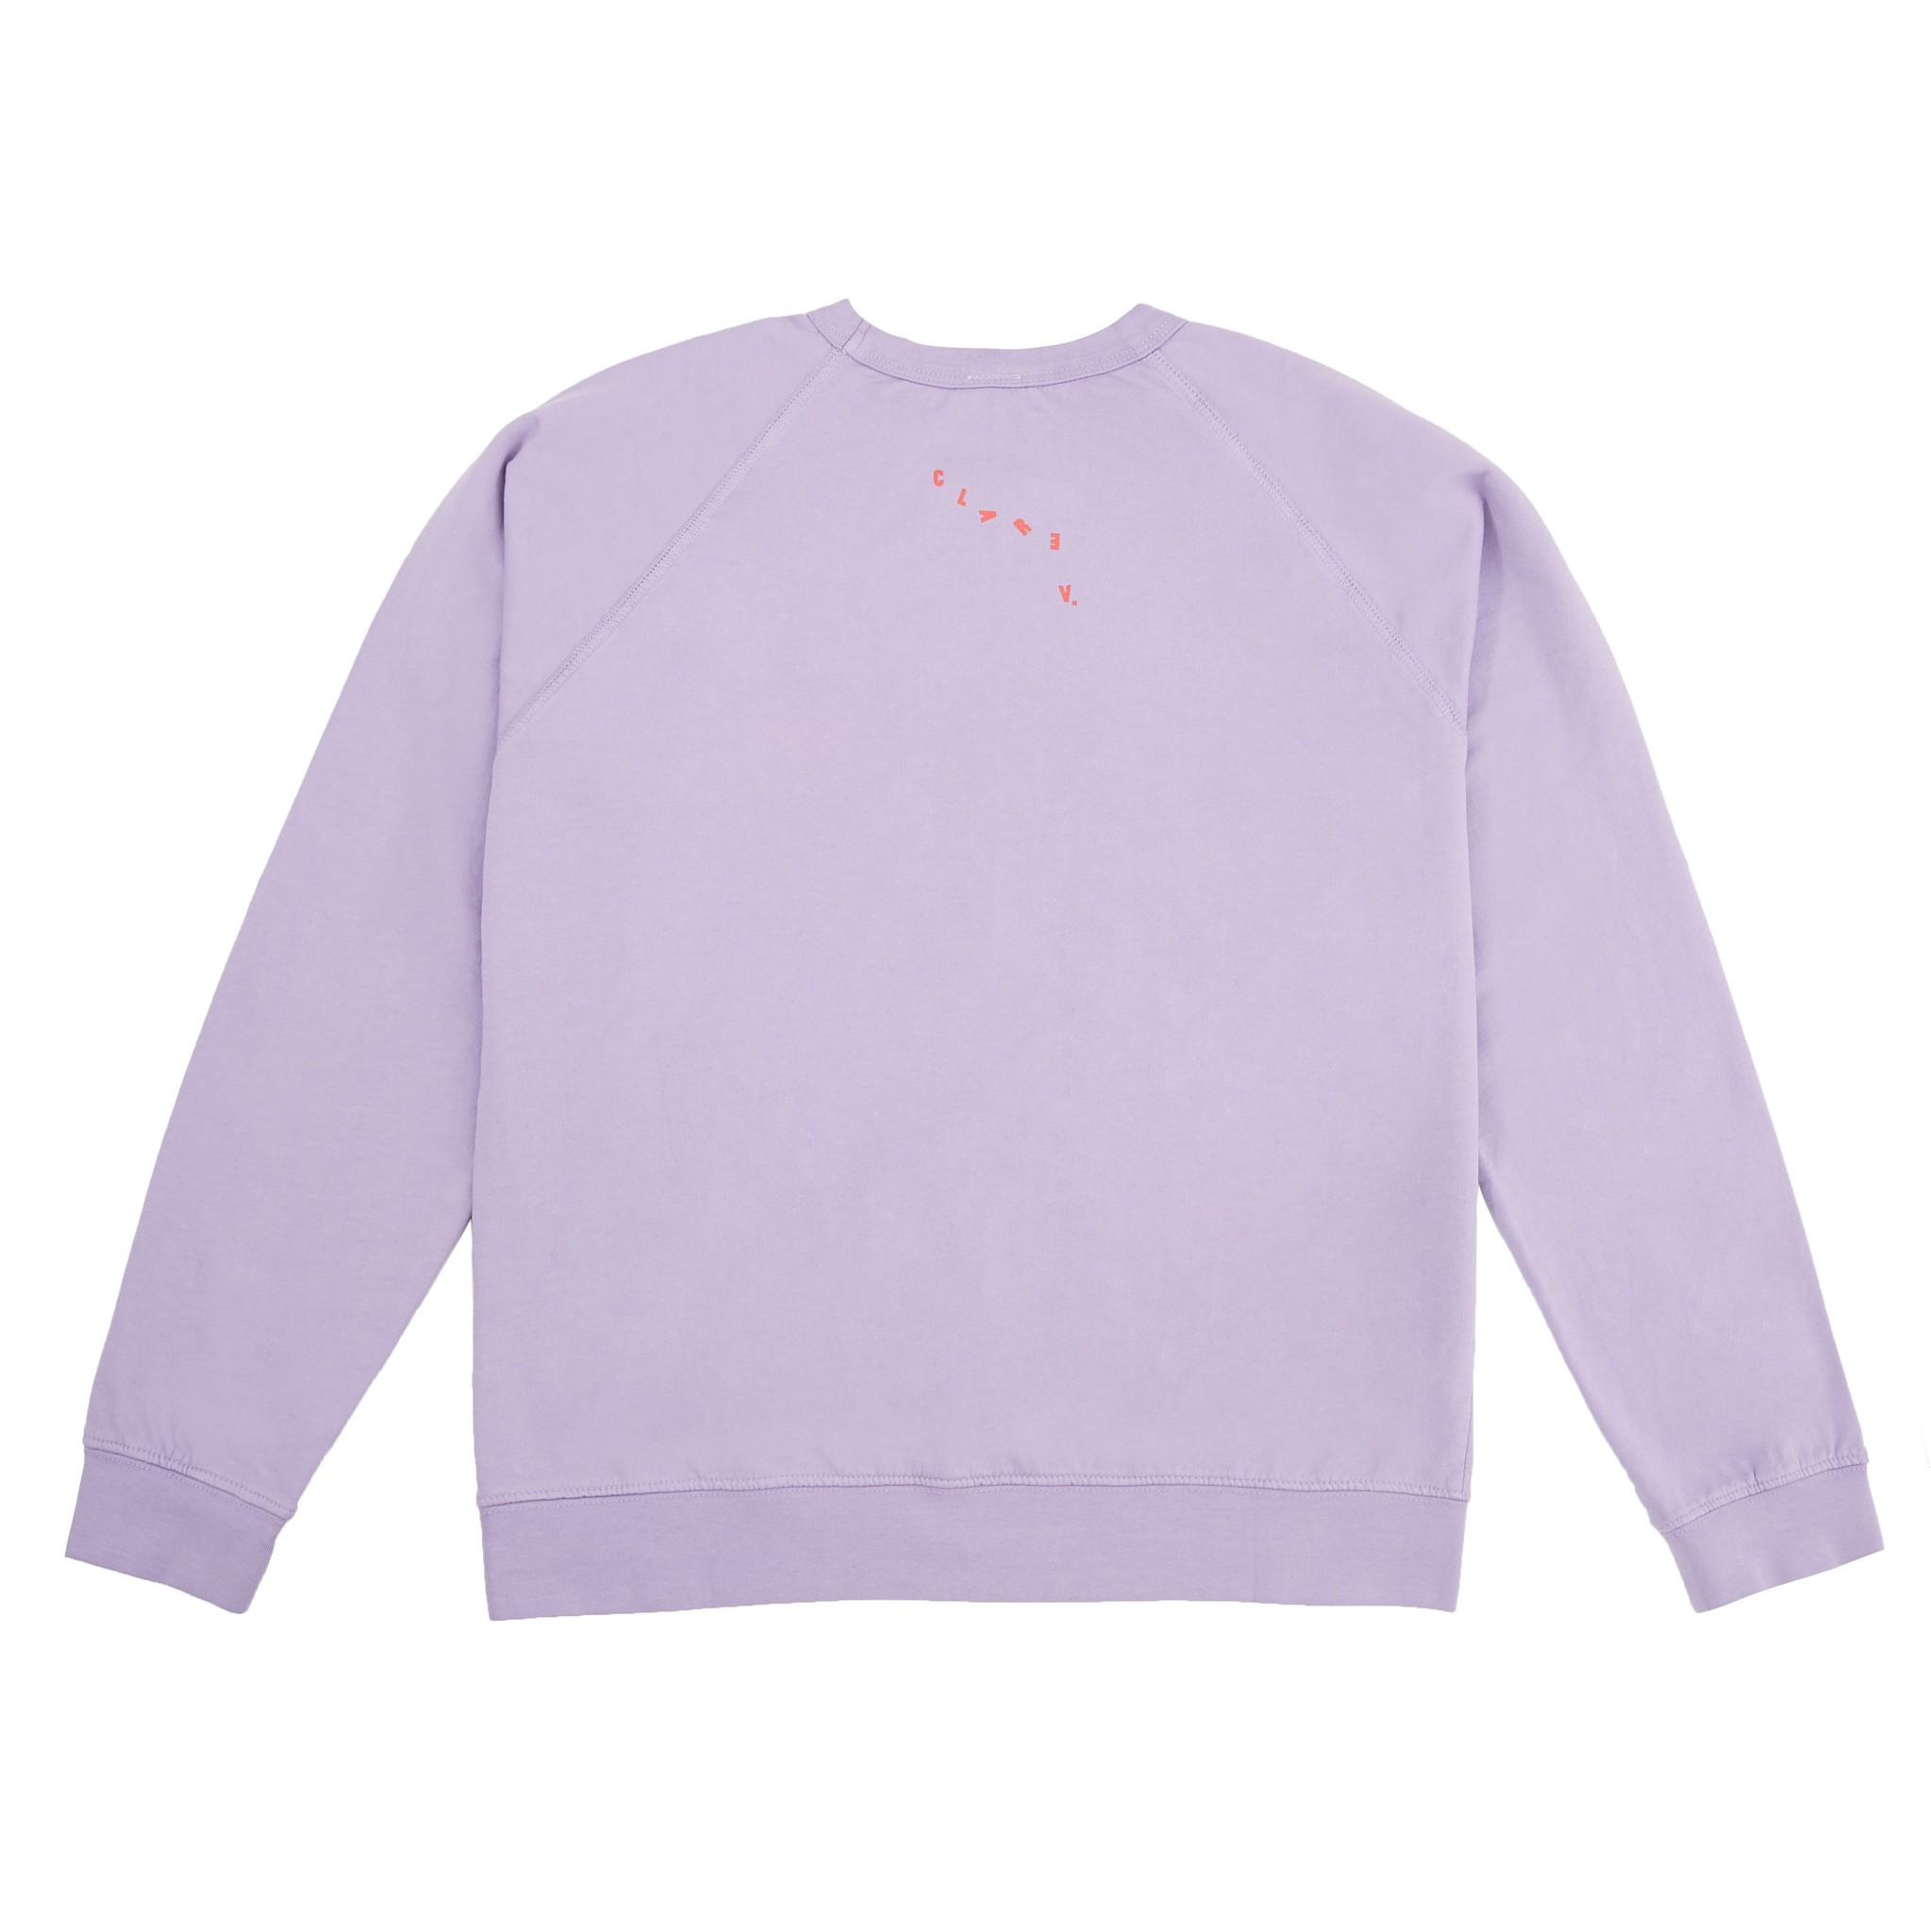 L/S Purple Sweatshirt with Lip Illustration